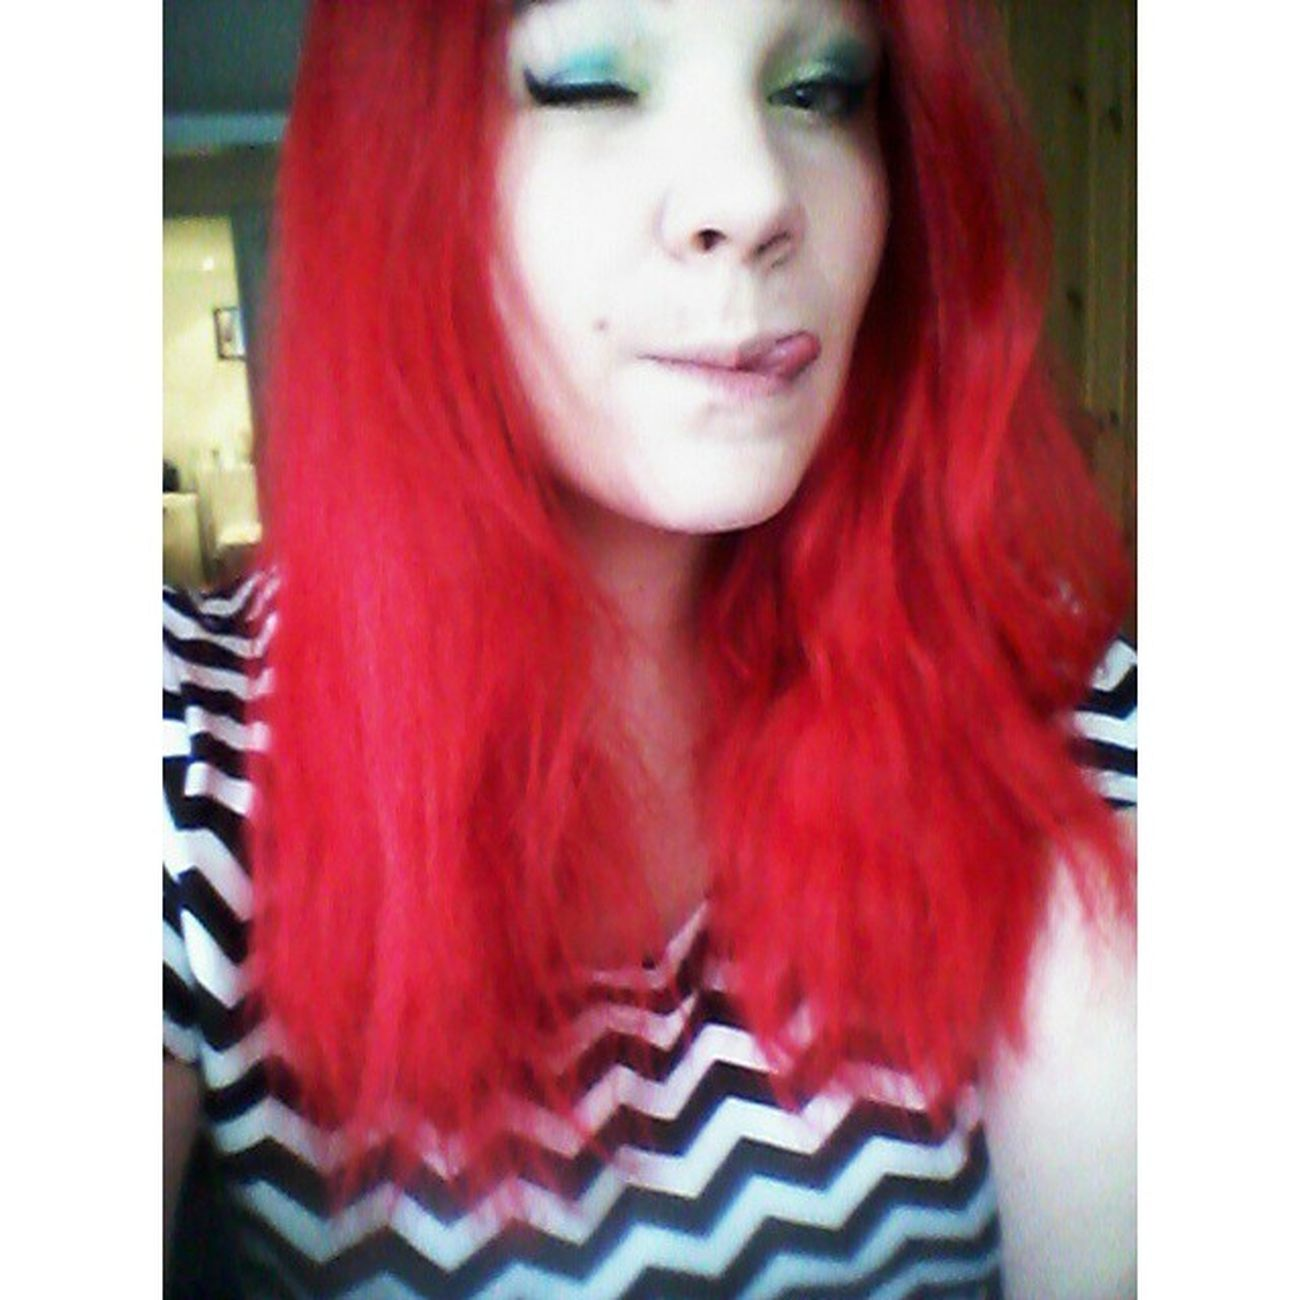 Somethingnew Me Redhead Fire Burninghair